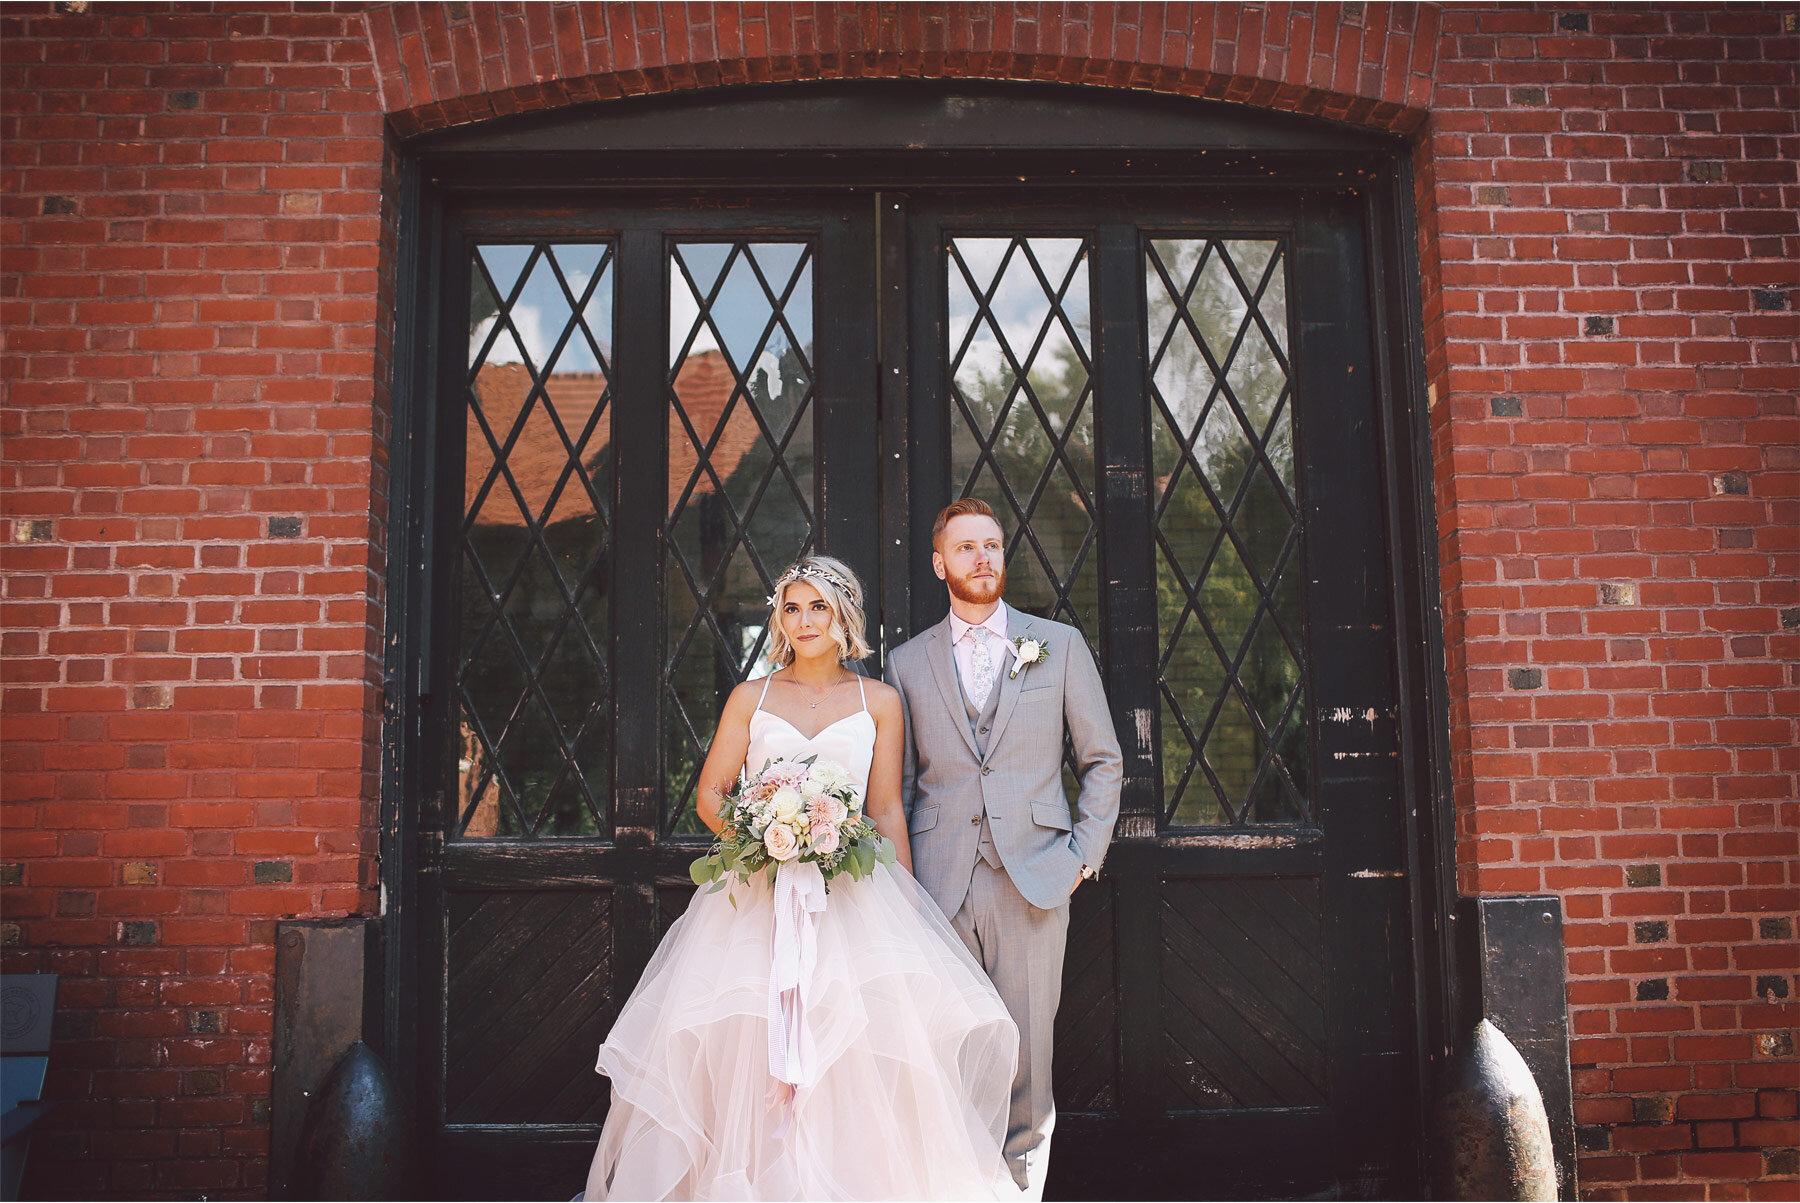 08-Vick-Photography-Wedding-Duluth-Minnesota-Glensheen-Mansion-Groom-Bride-Doors-Catherine-and-John.jpg